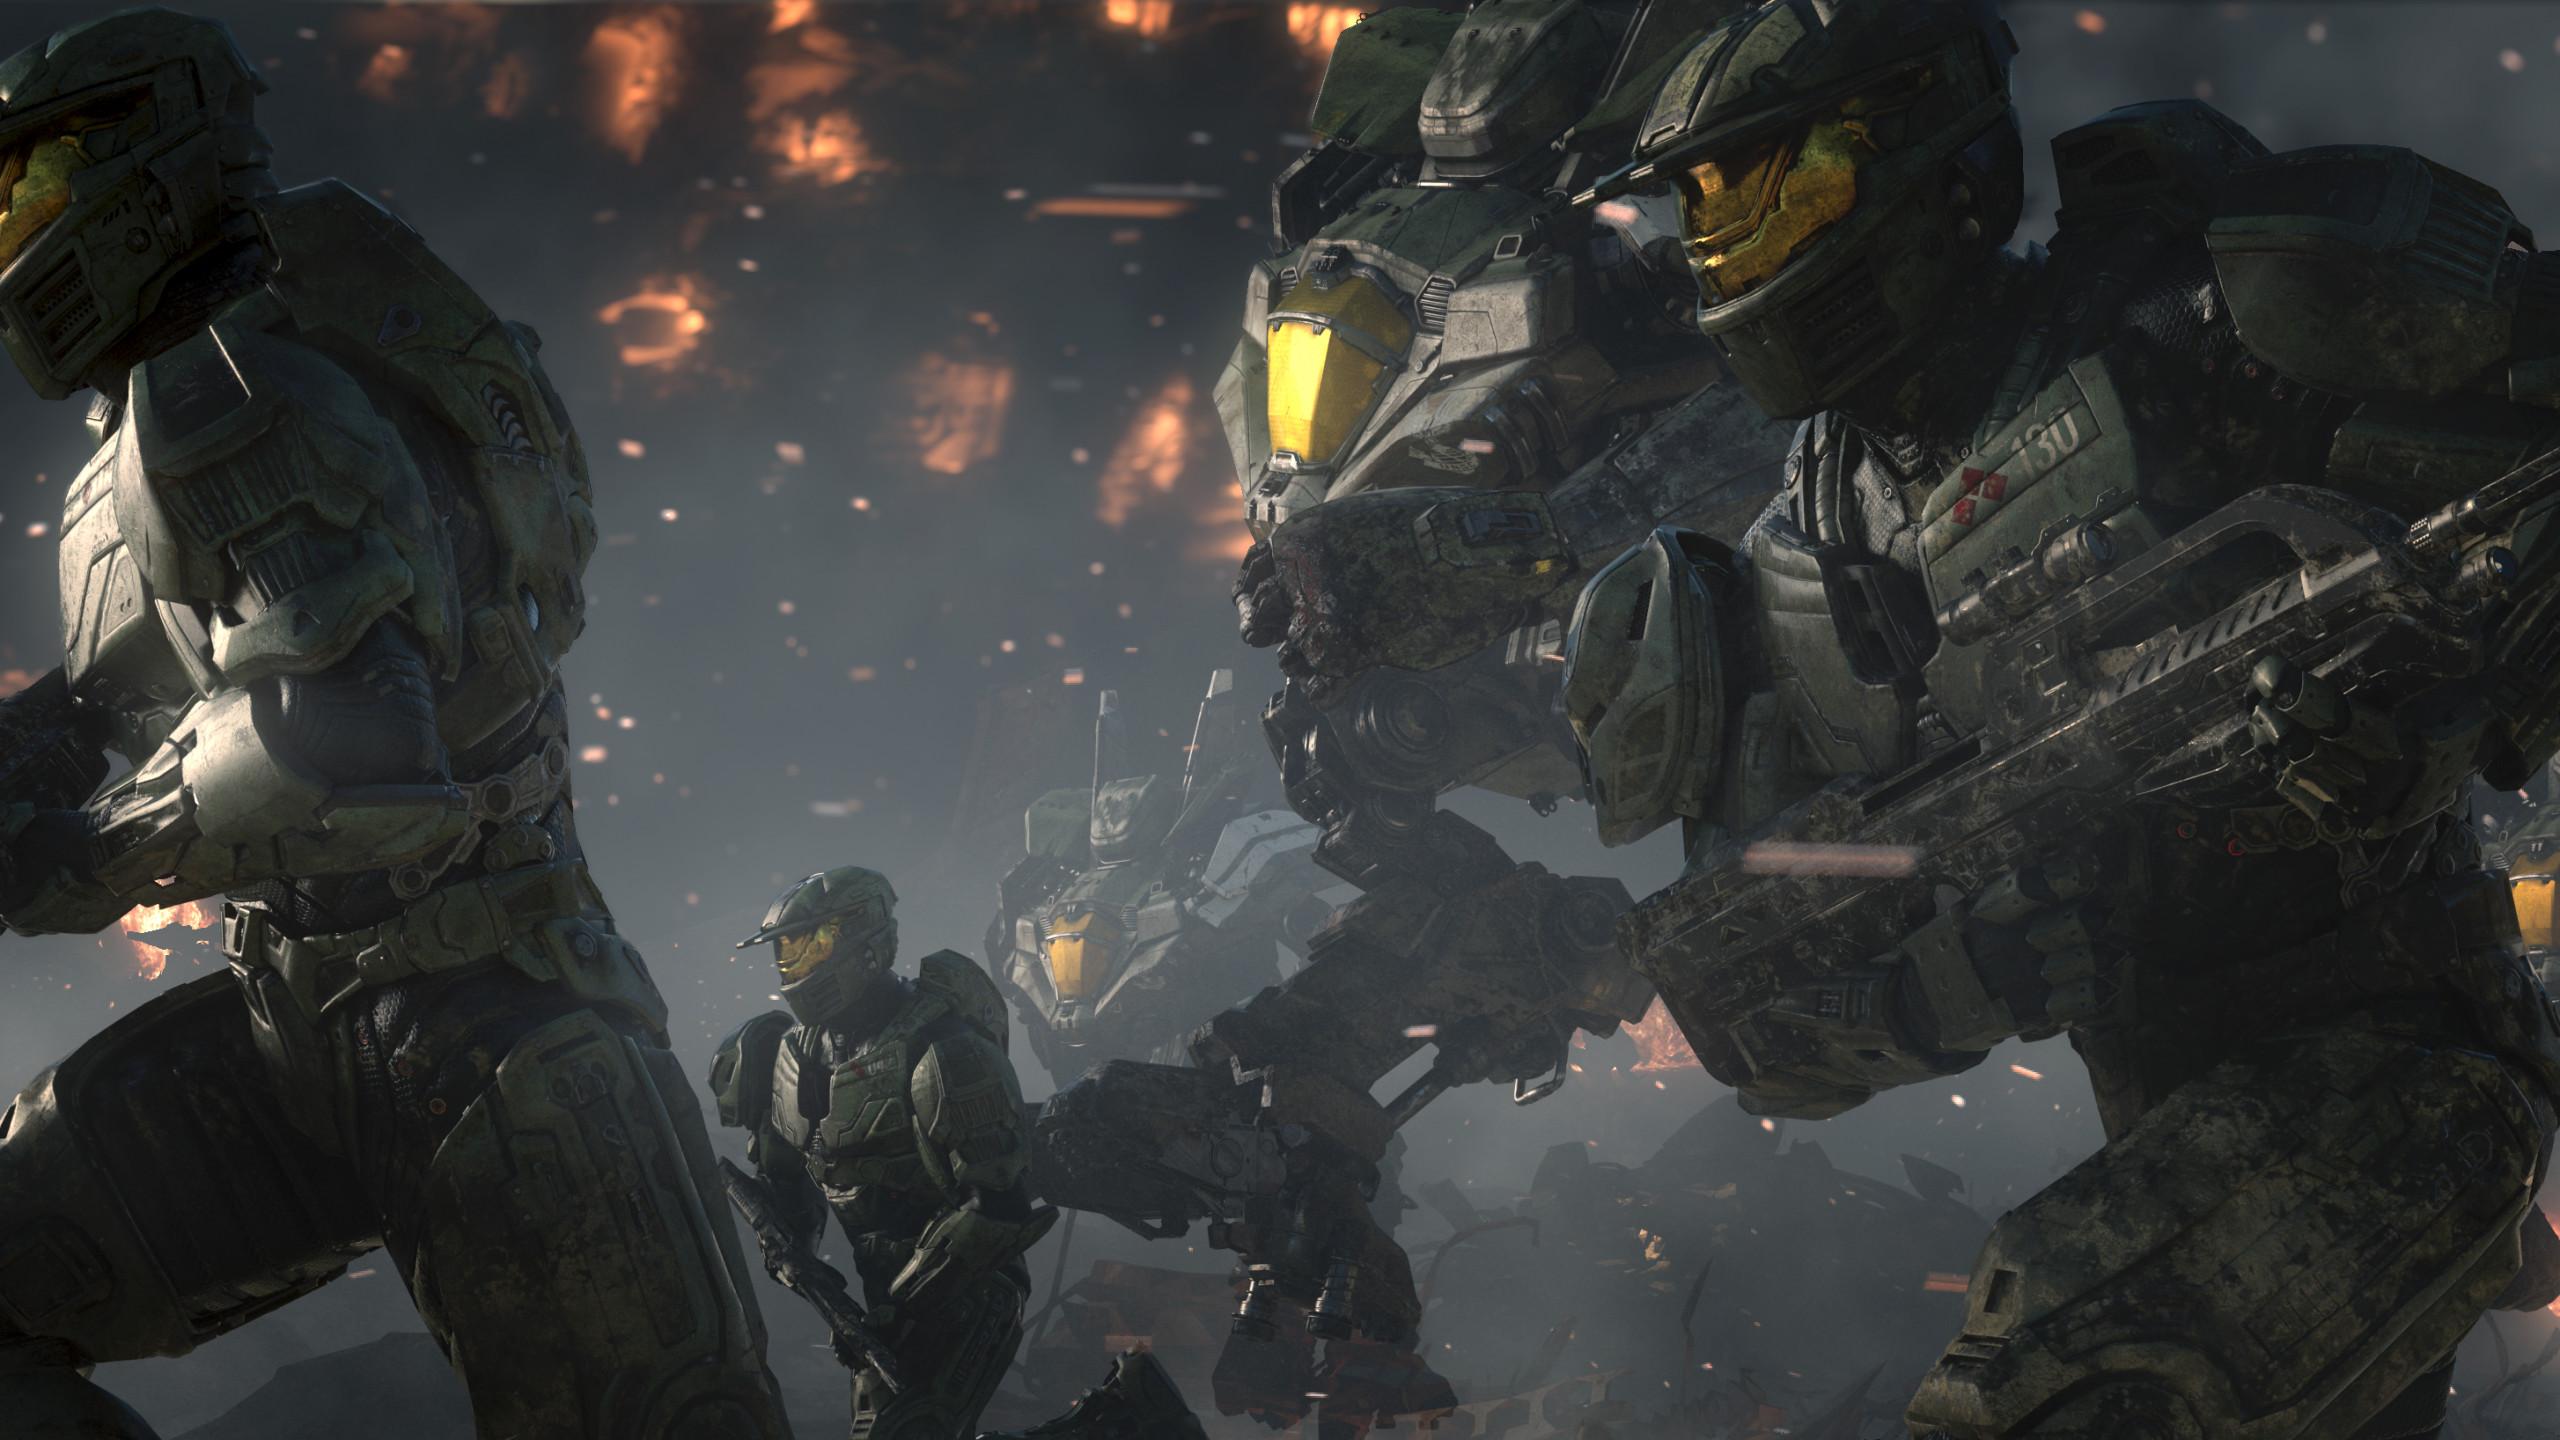 Games / Halo Wars 2 Wallpaper